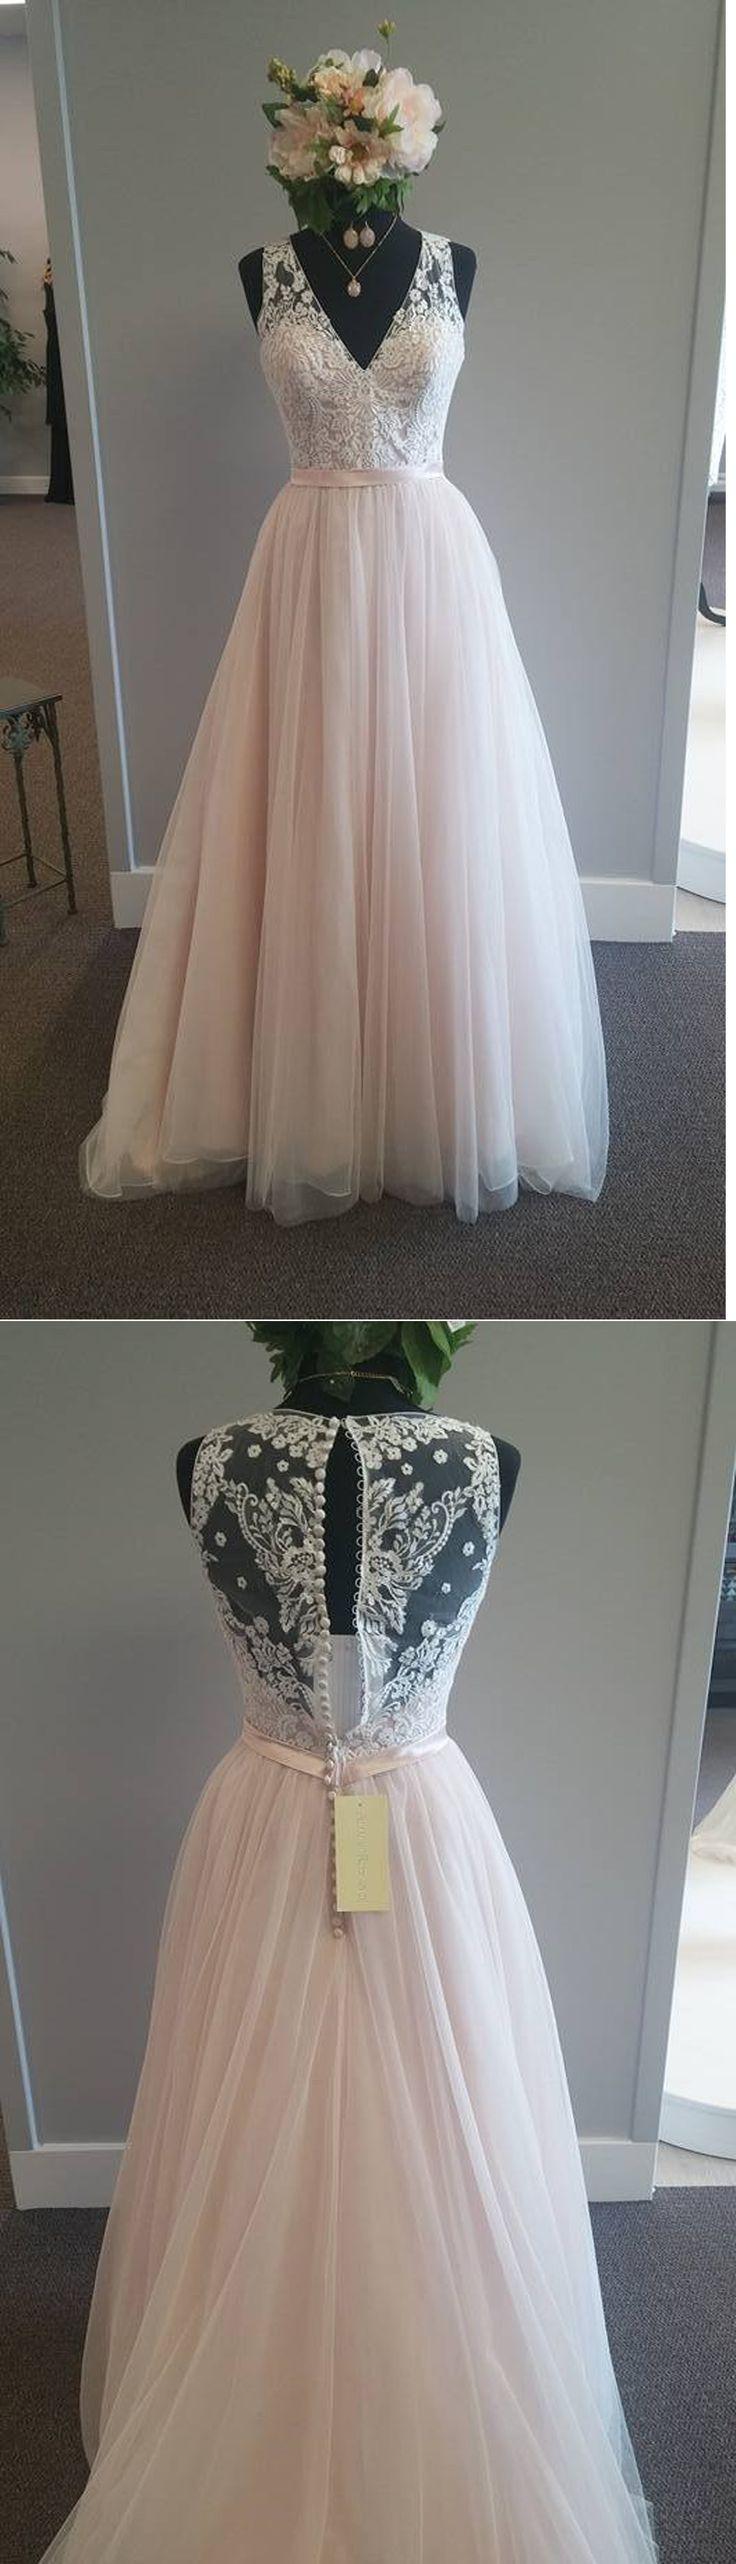 Best 25+ Pink wedding dresses ideas on Pinterest | Pink princess ...